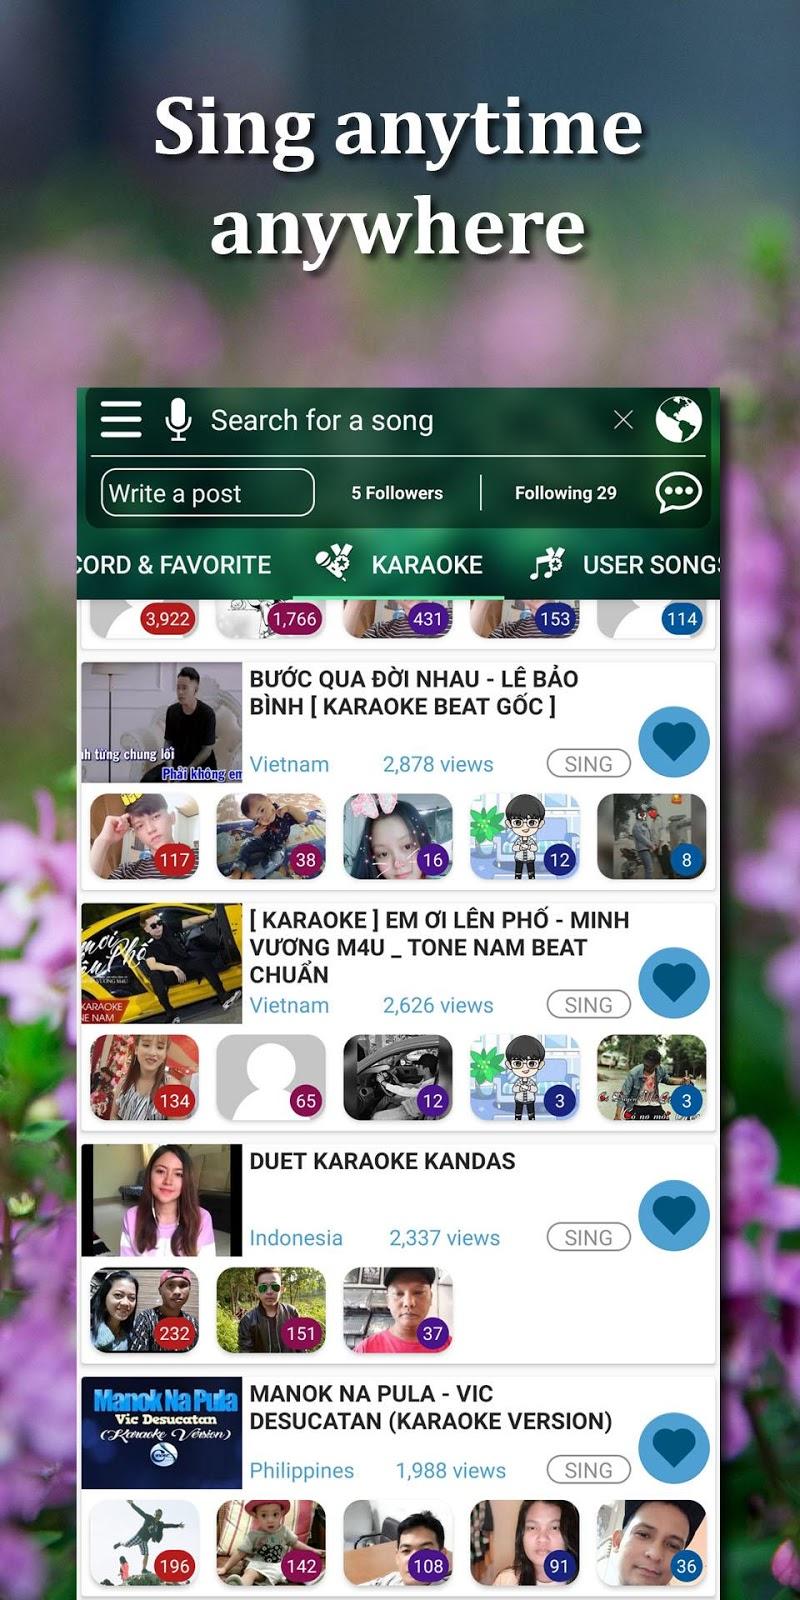 Kakoke-sing karaoke, voice recorder, singing app v4.7.3 [PRO] APK [Latest]